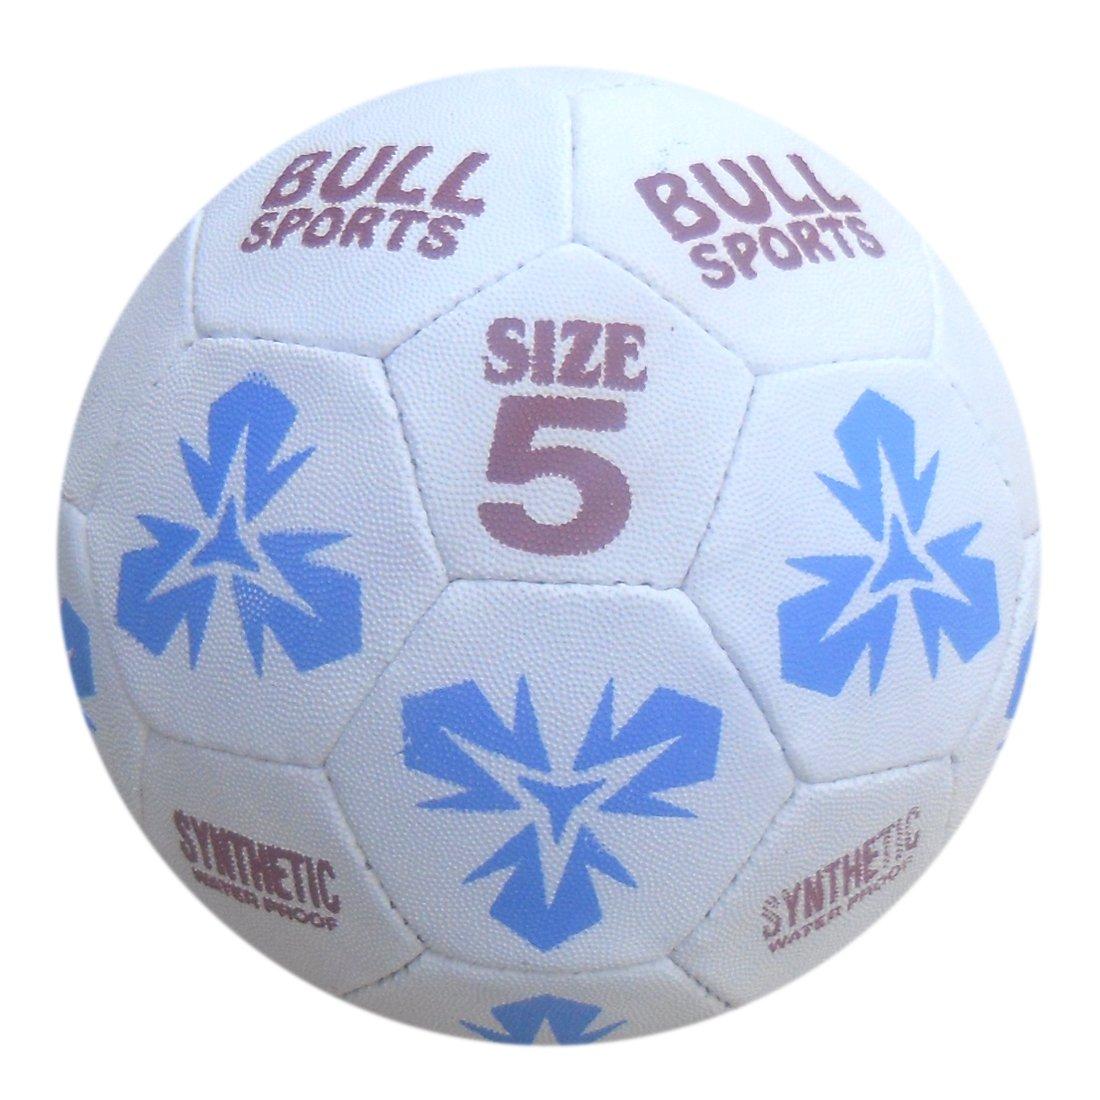 Bull Sports Rubber Football ( SIZE 5 )